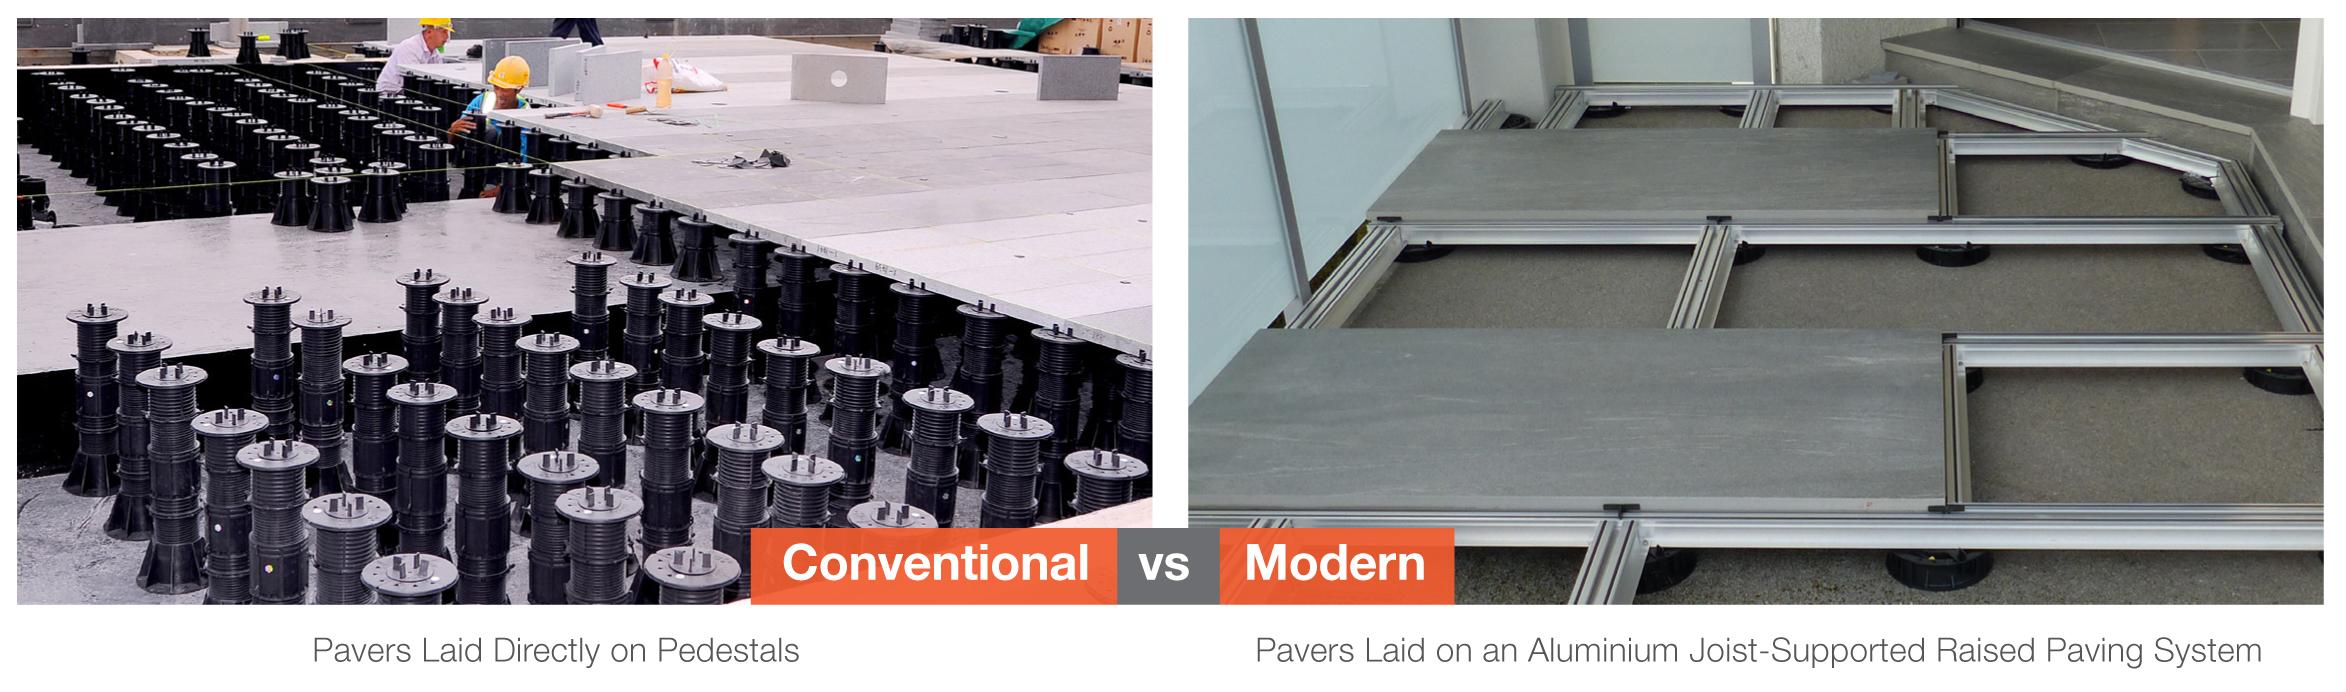 New Raised Paving And Decking Product Versiframe Aluminium Joist Elmich Pte Ltd